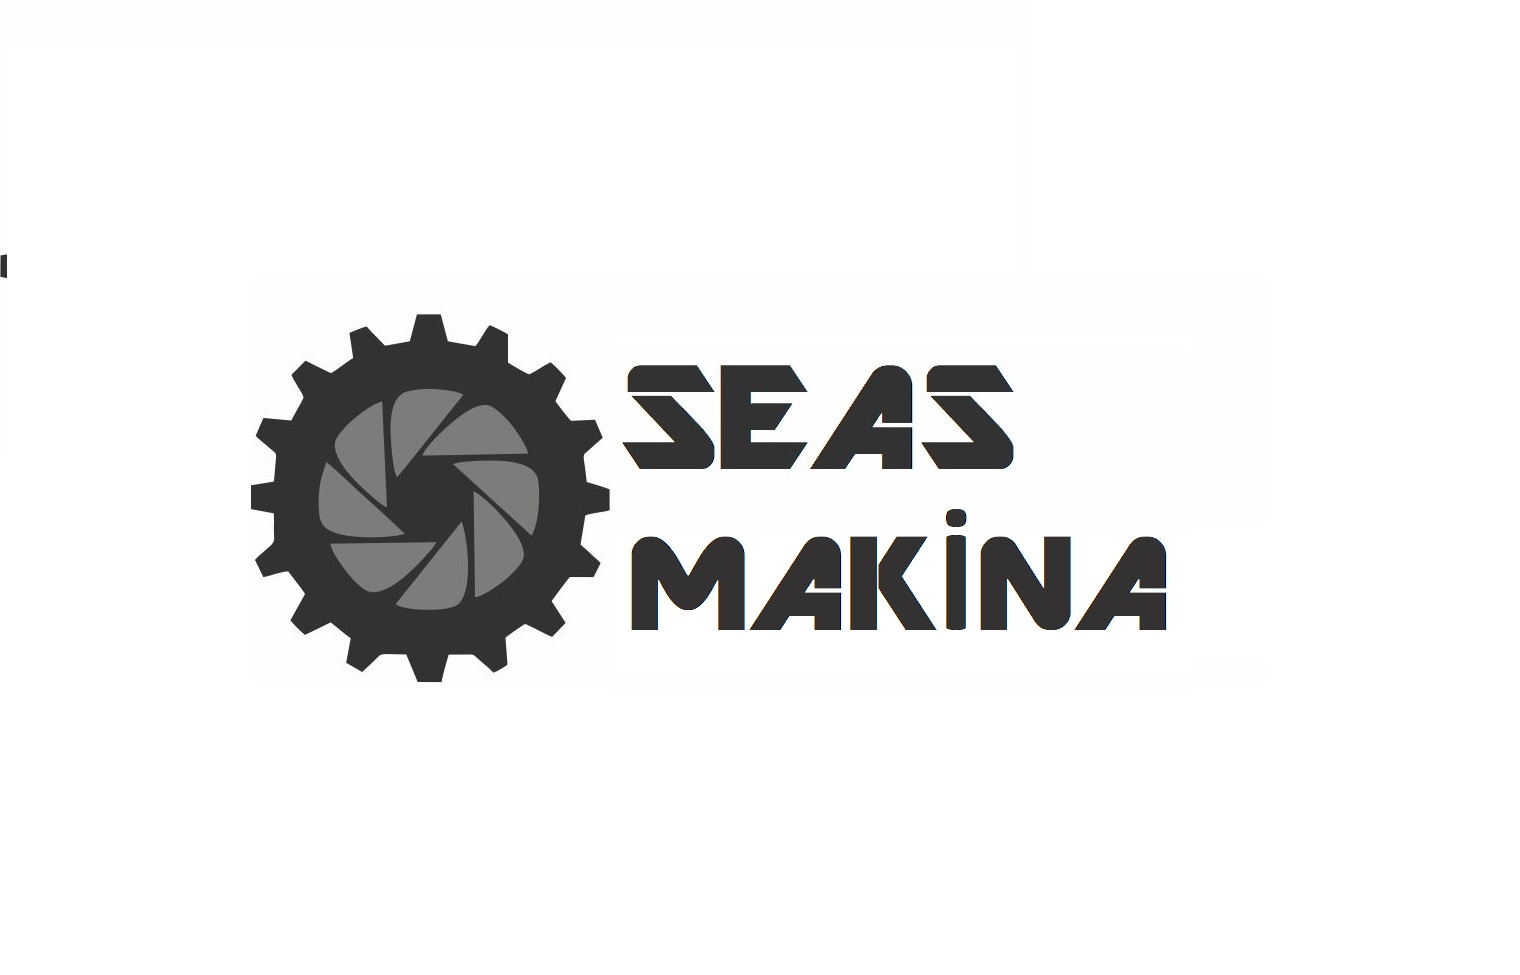 Seas makina basınçlı kaplar imalatı